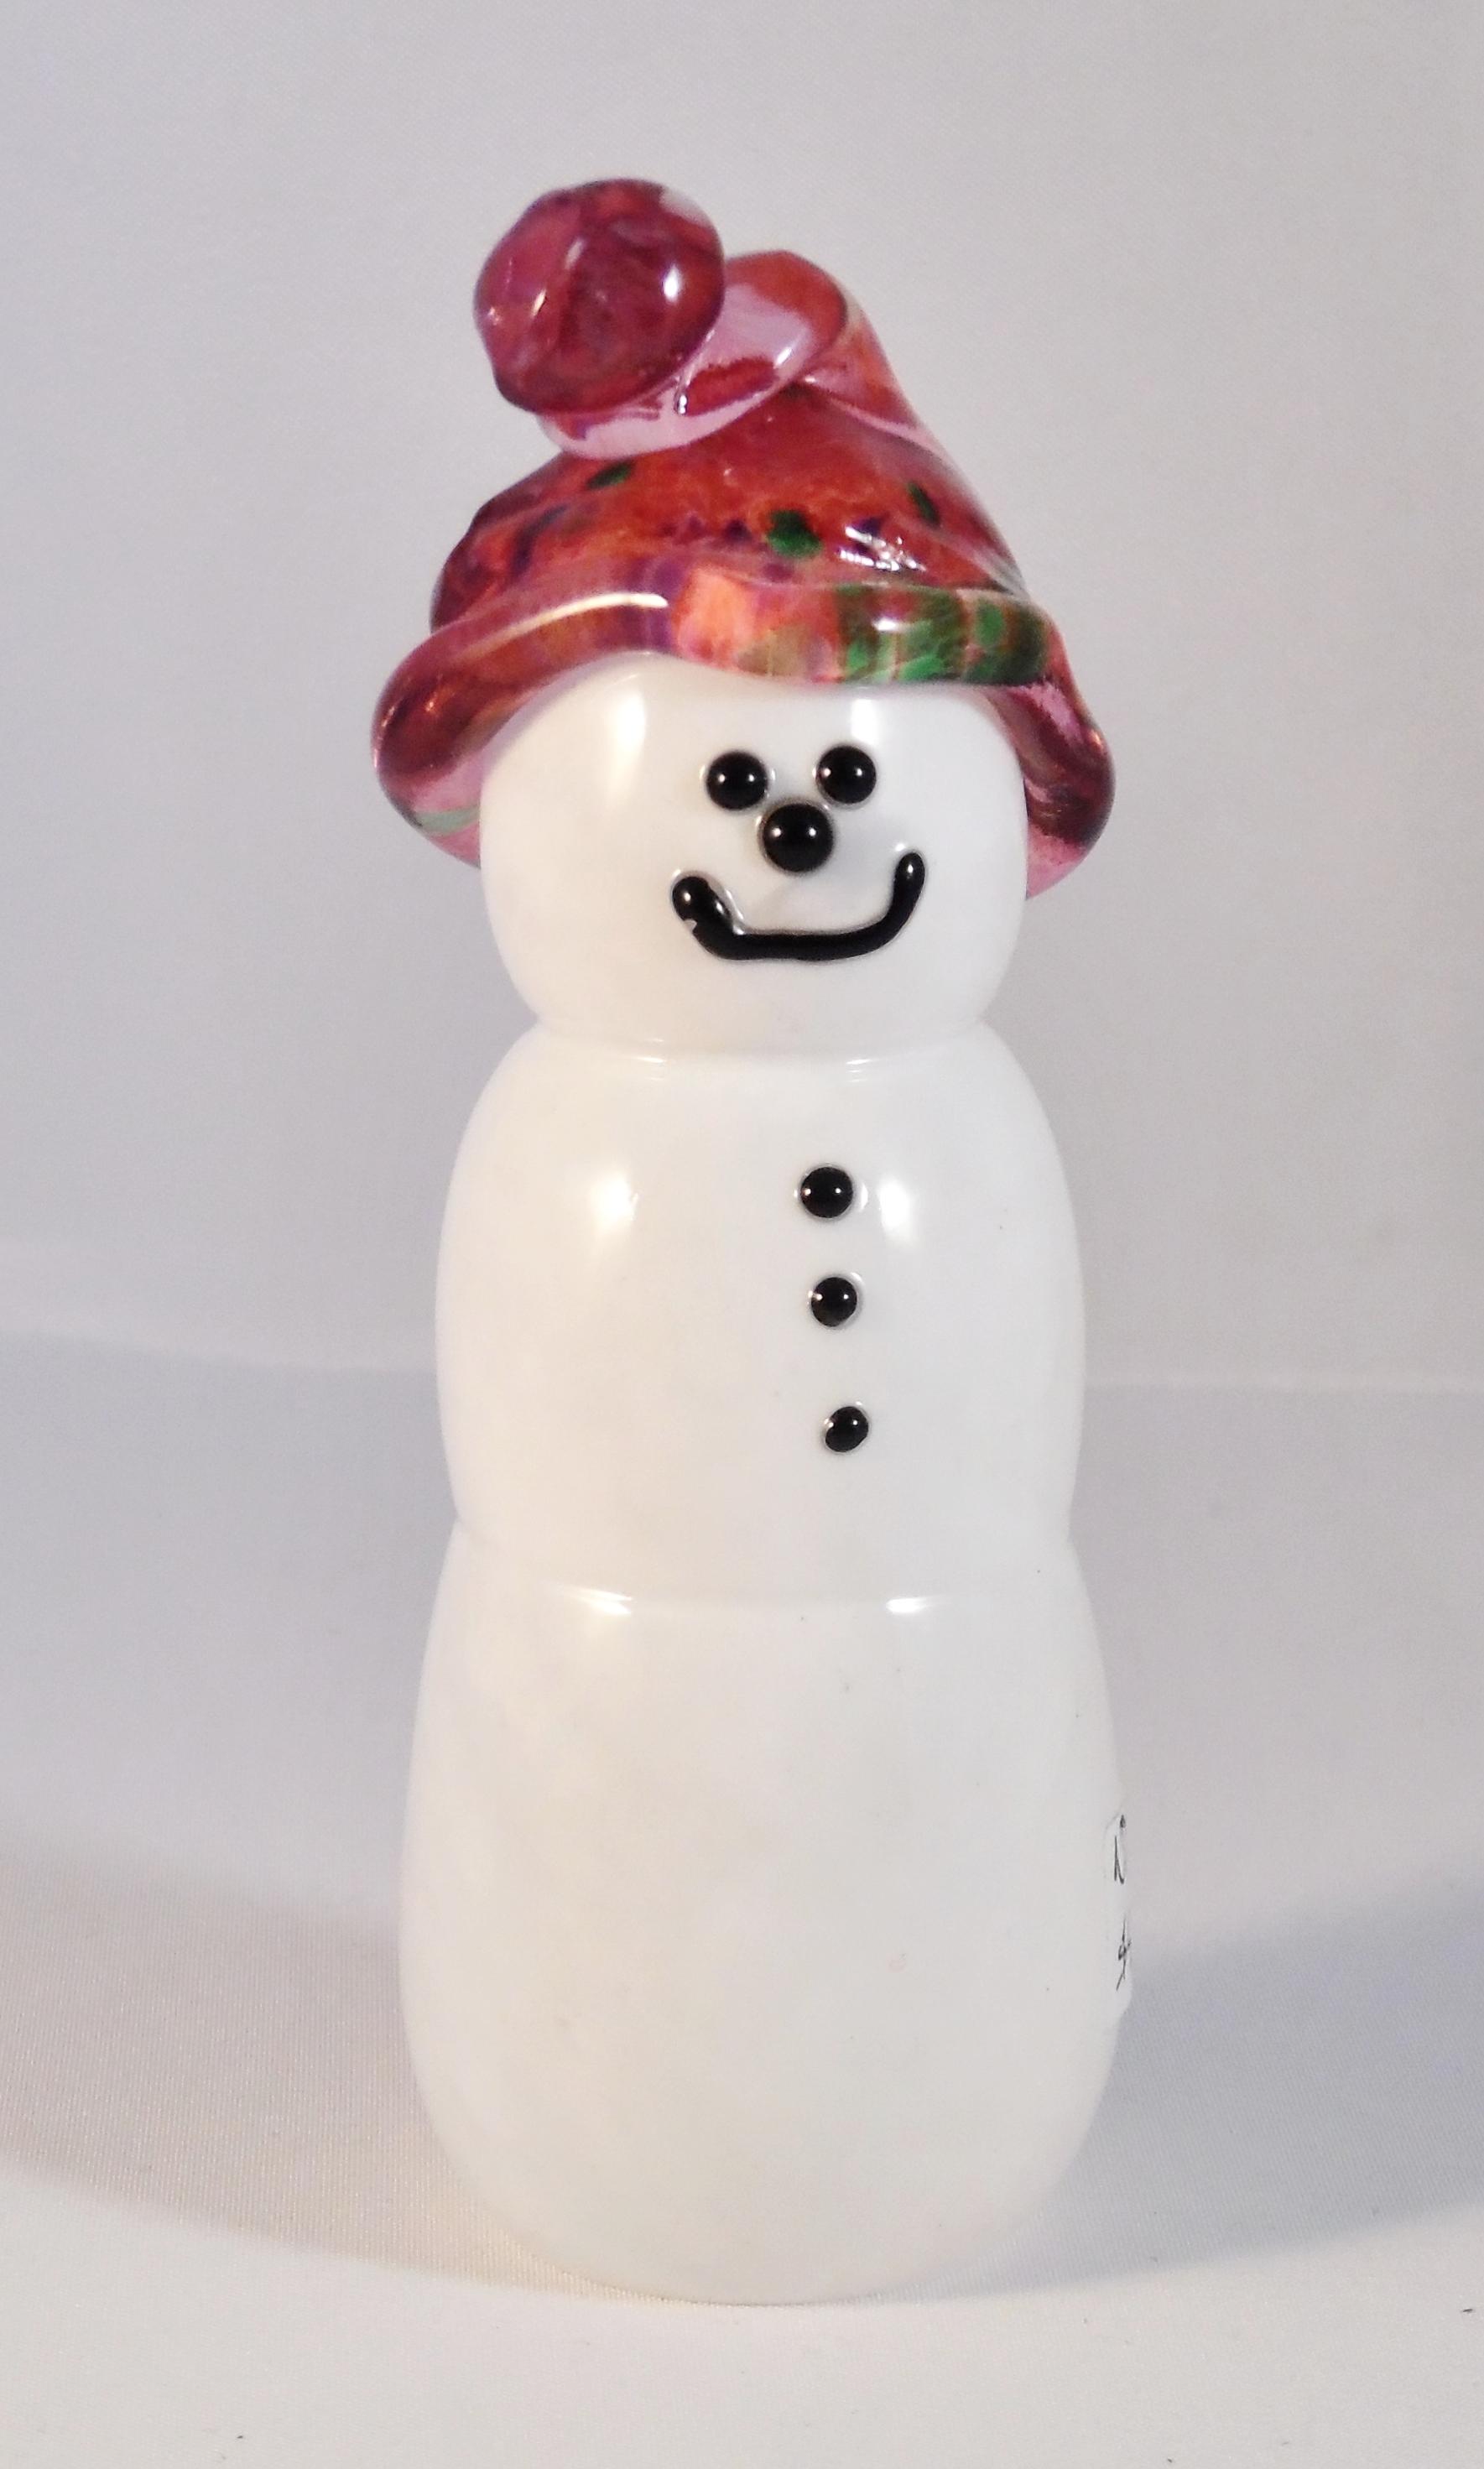 Snowman by Nicole Tremblay